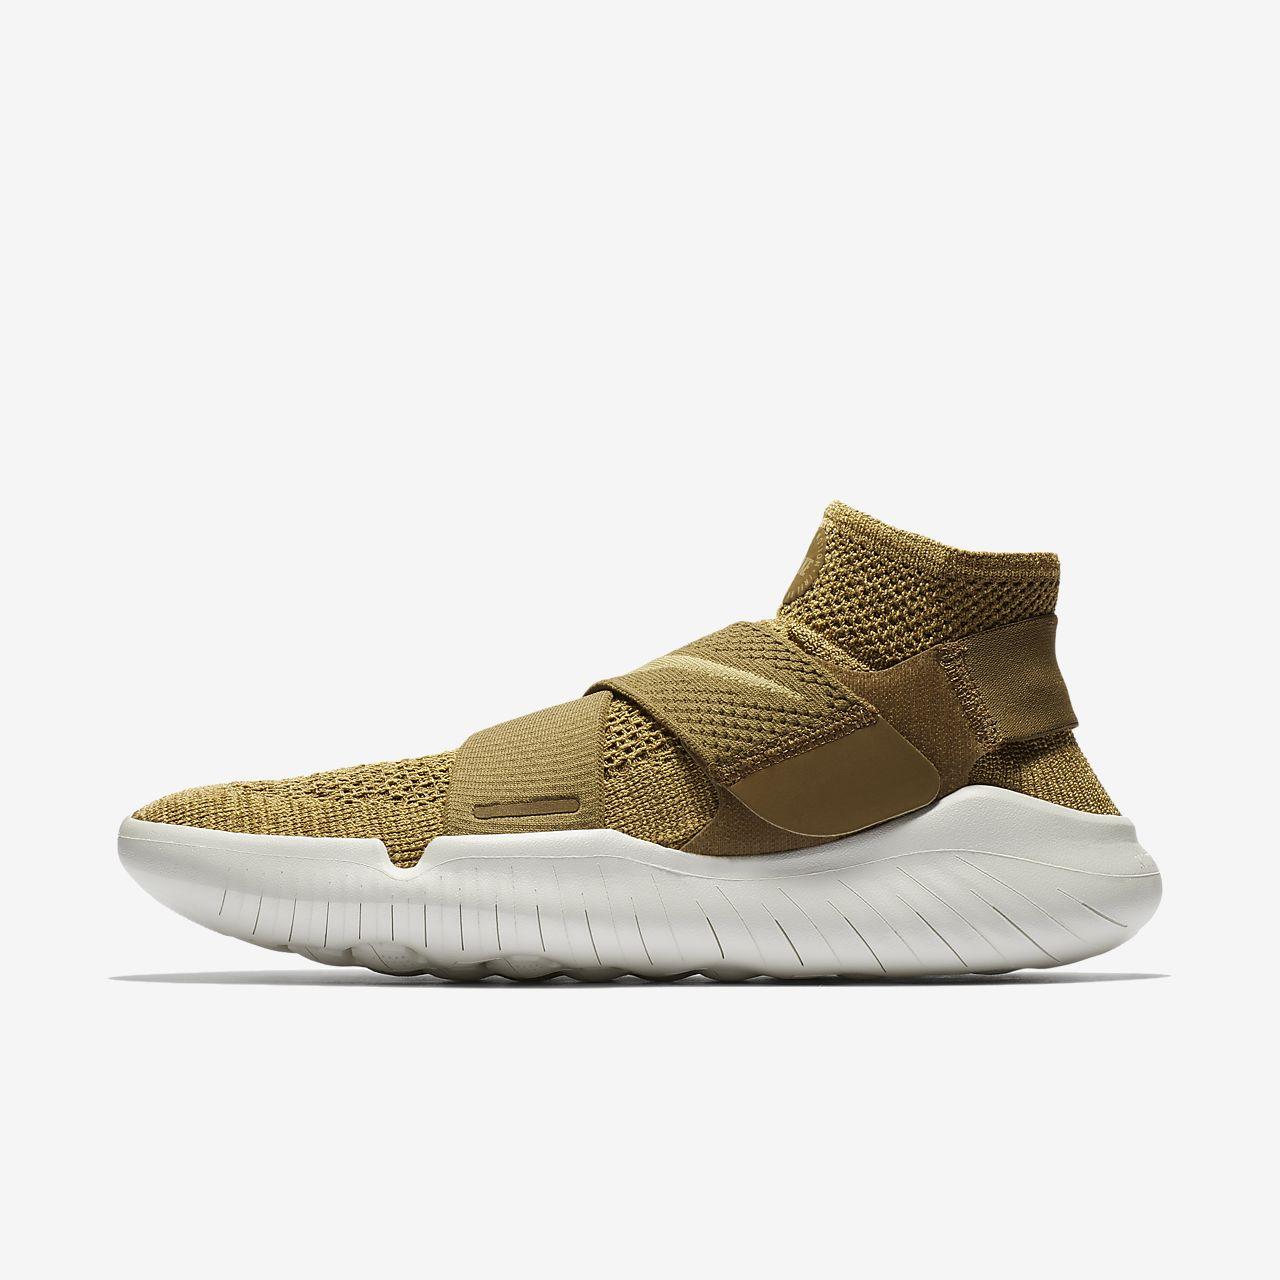 1501625e7fb2 Nike Free RN Motion Flyknit 2018 Men s Running Shoe. Nike.com